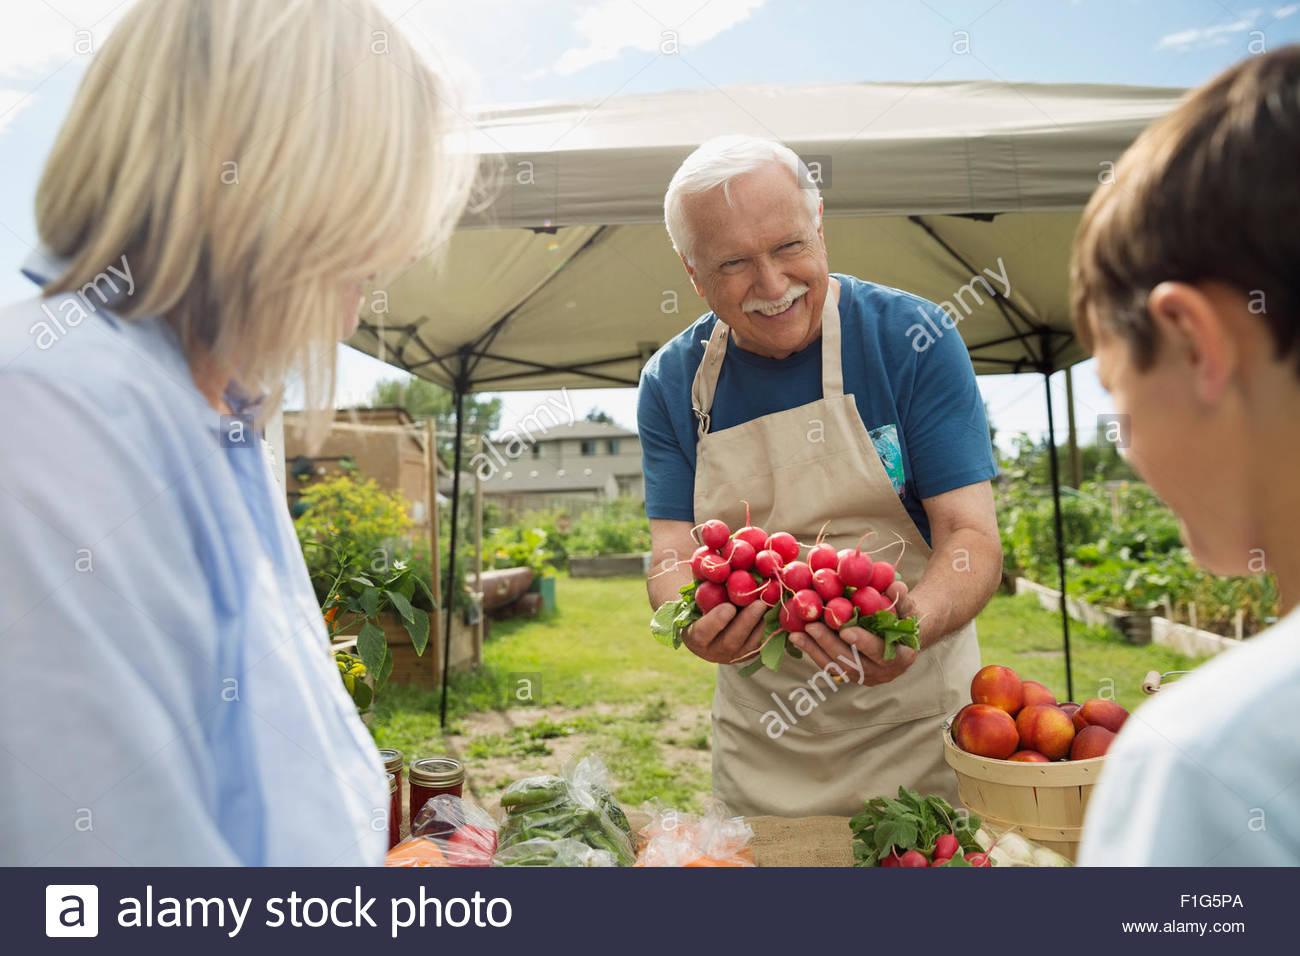 Proud farmer showing radishes boy farmers market stall - Stock Image